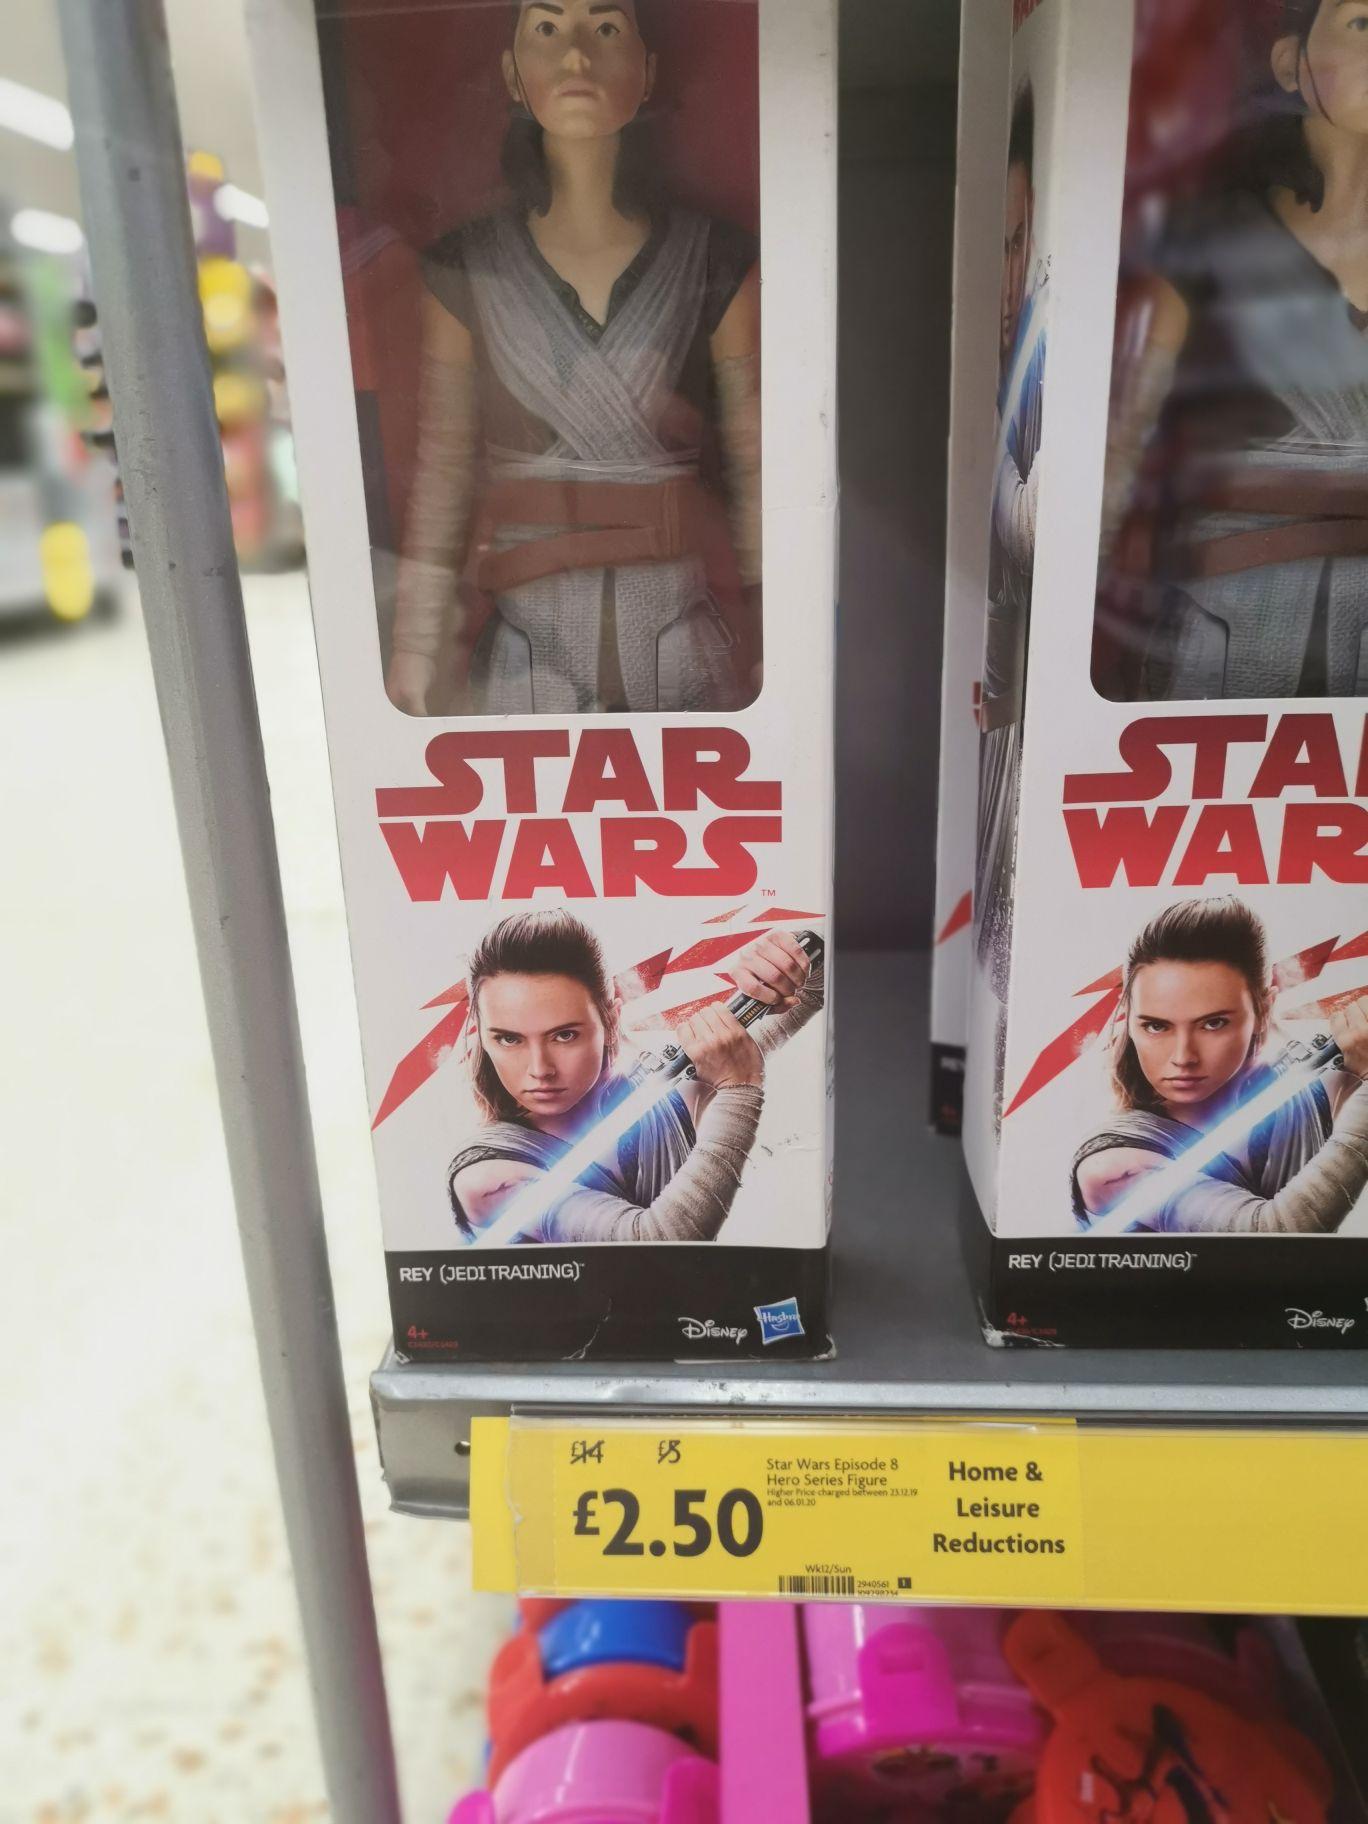 Star Wars Rey doll originally £14 at Morrisons Rotherham